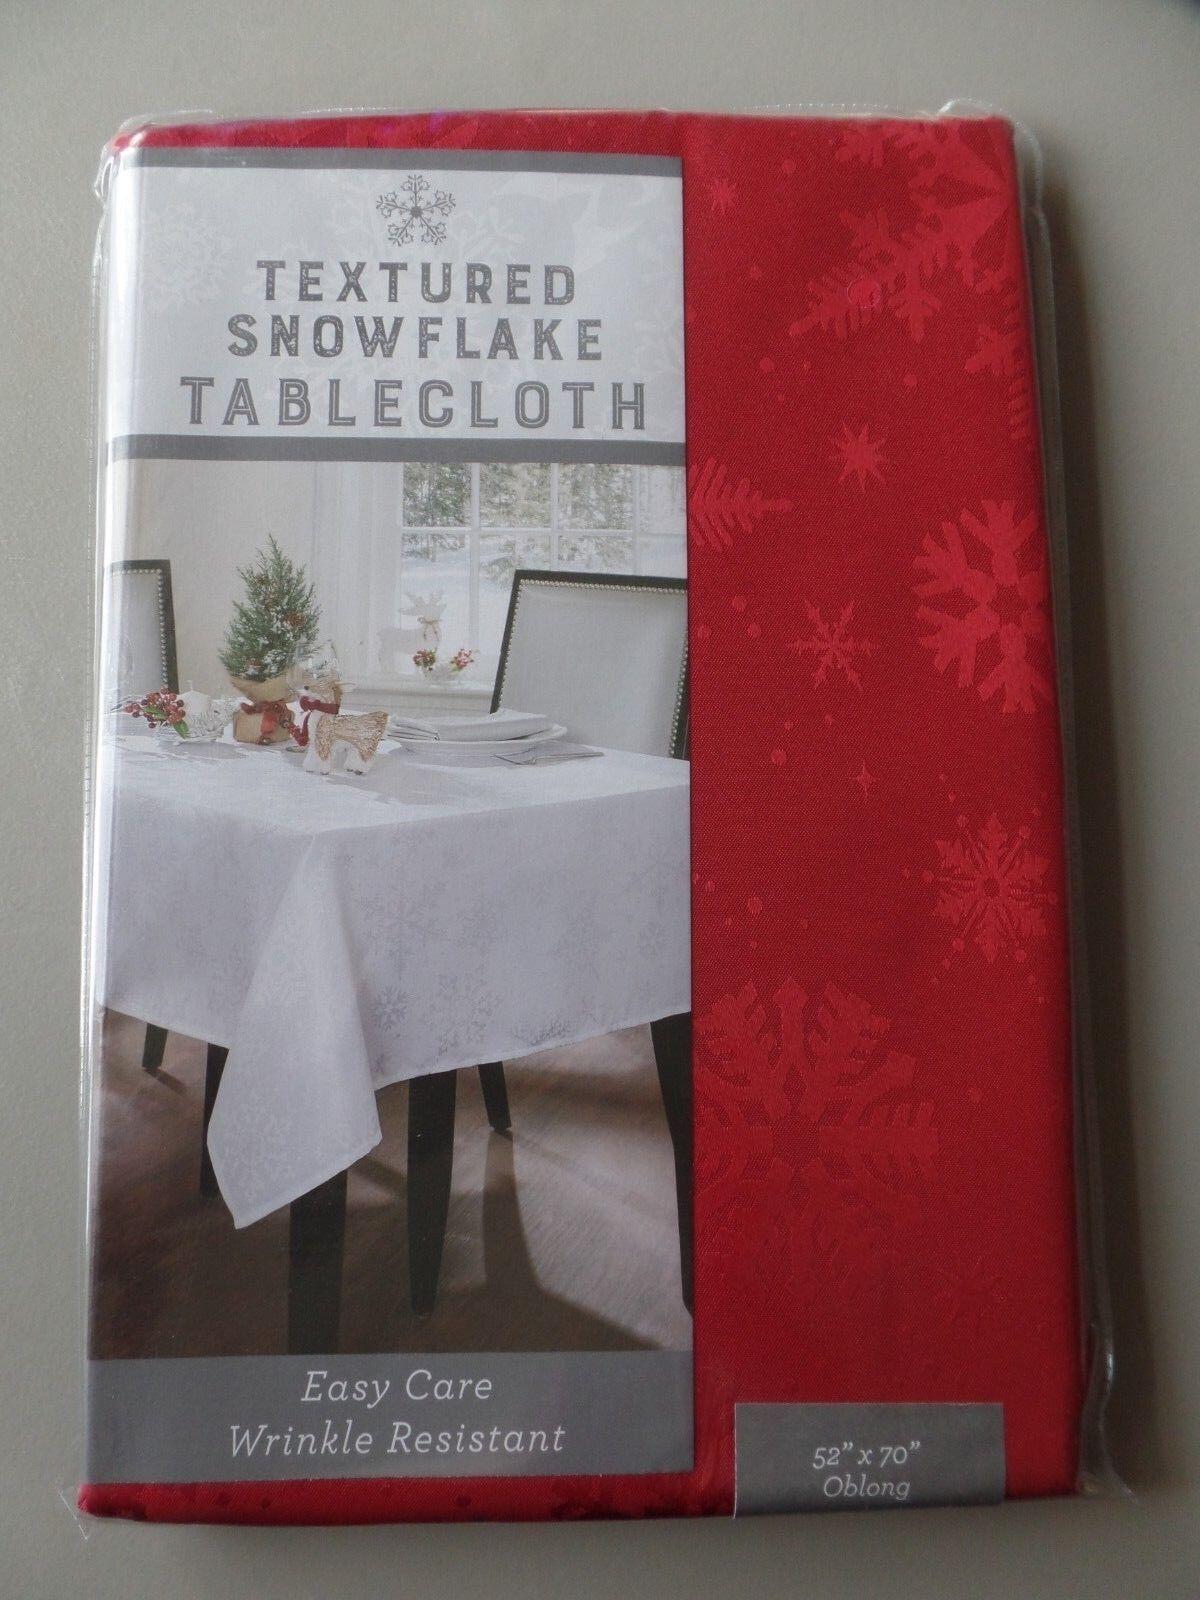 "Benson Mills Textured Snowflake Tablecloth 52"" x 70"" Oblong"